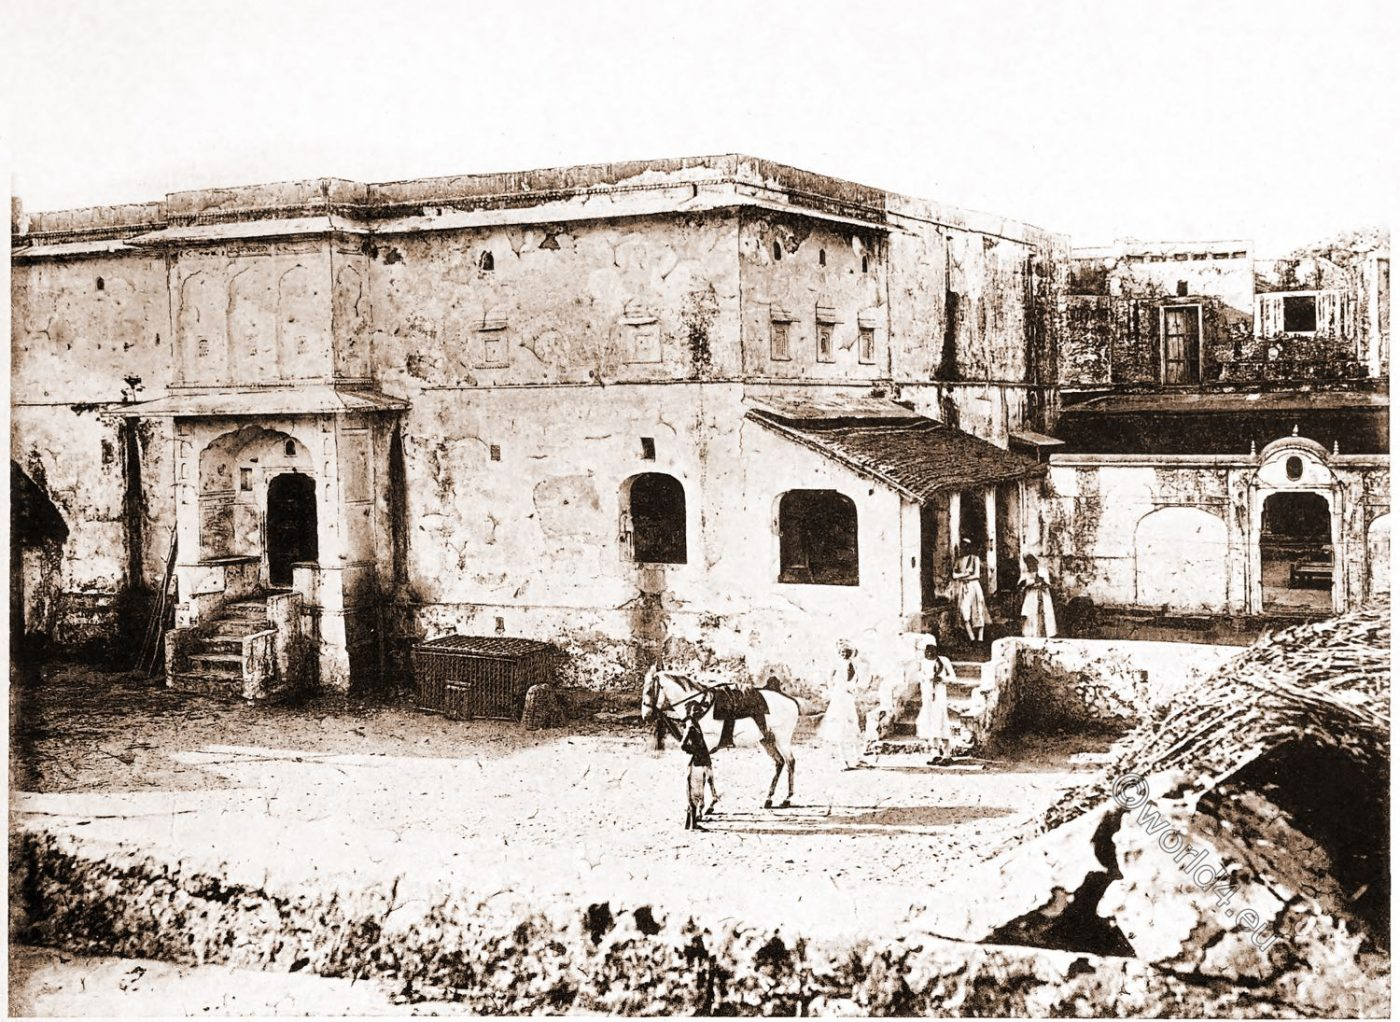 House, Rao Raja Pratap Singh, Alwar, India, Rajput, Rajasthan